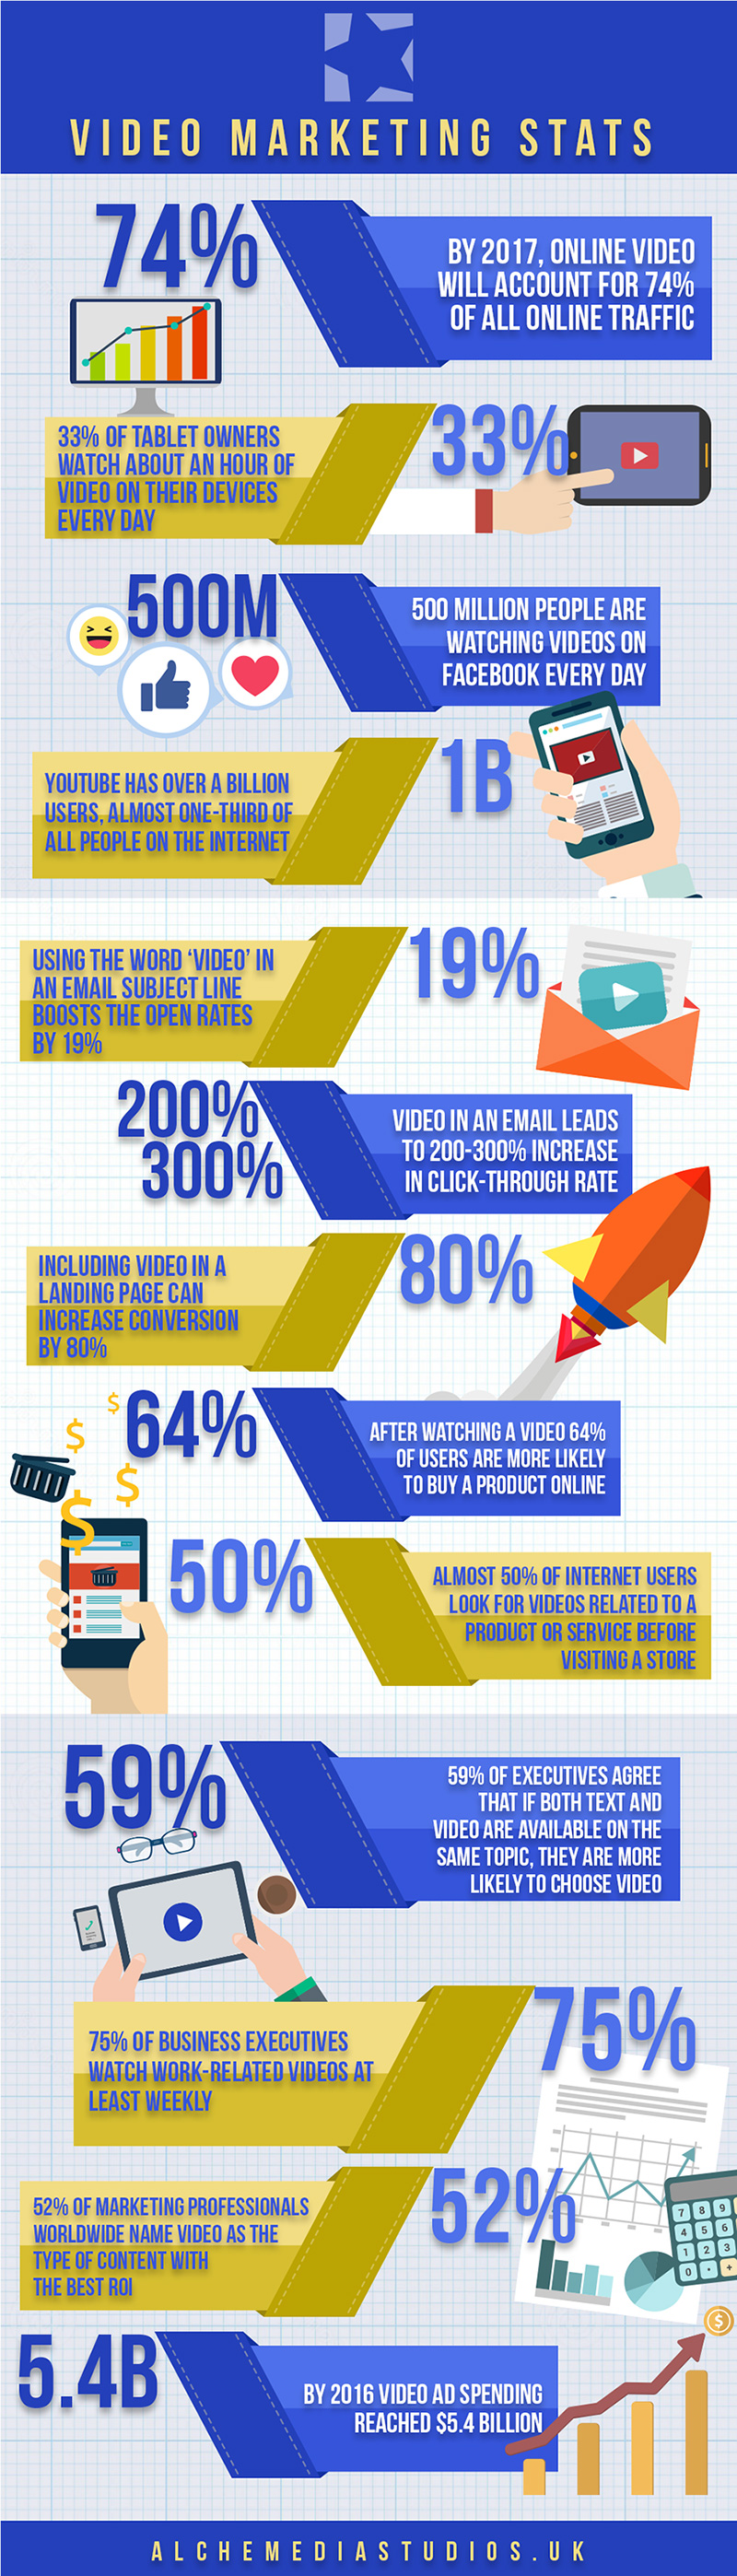 alchemedia-studios-video-marketing-infographic-2017